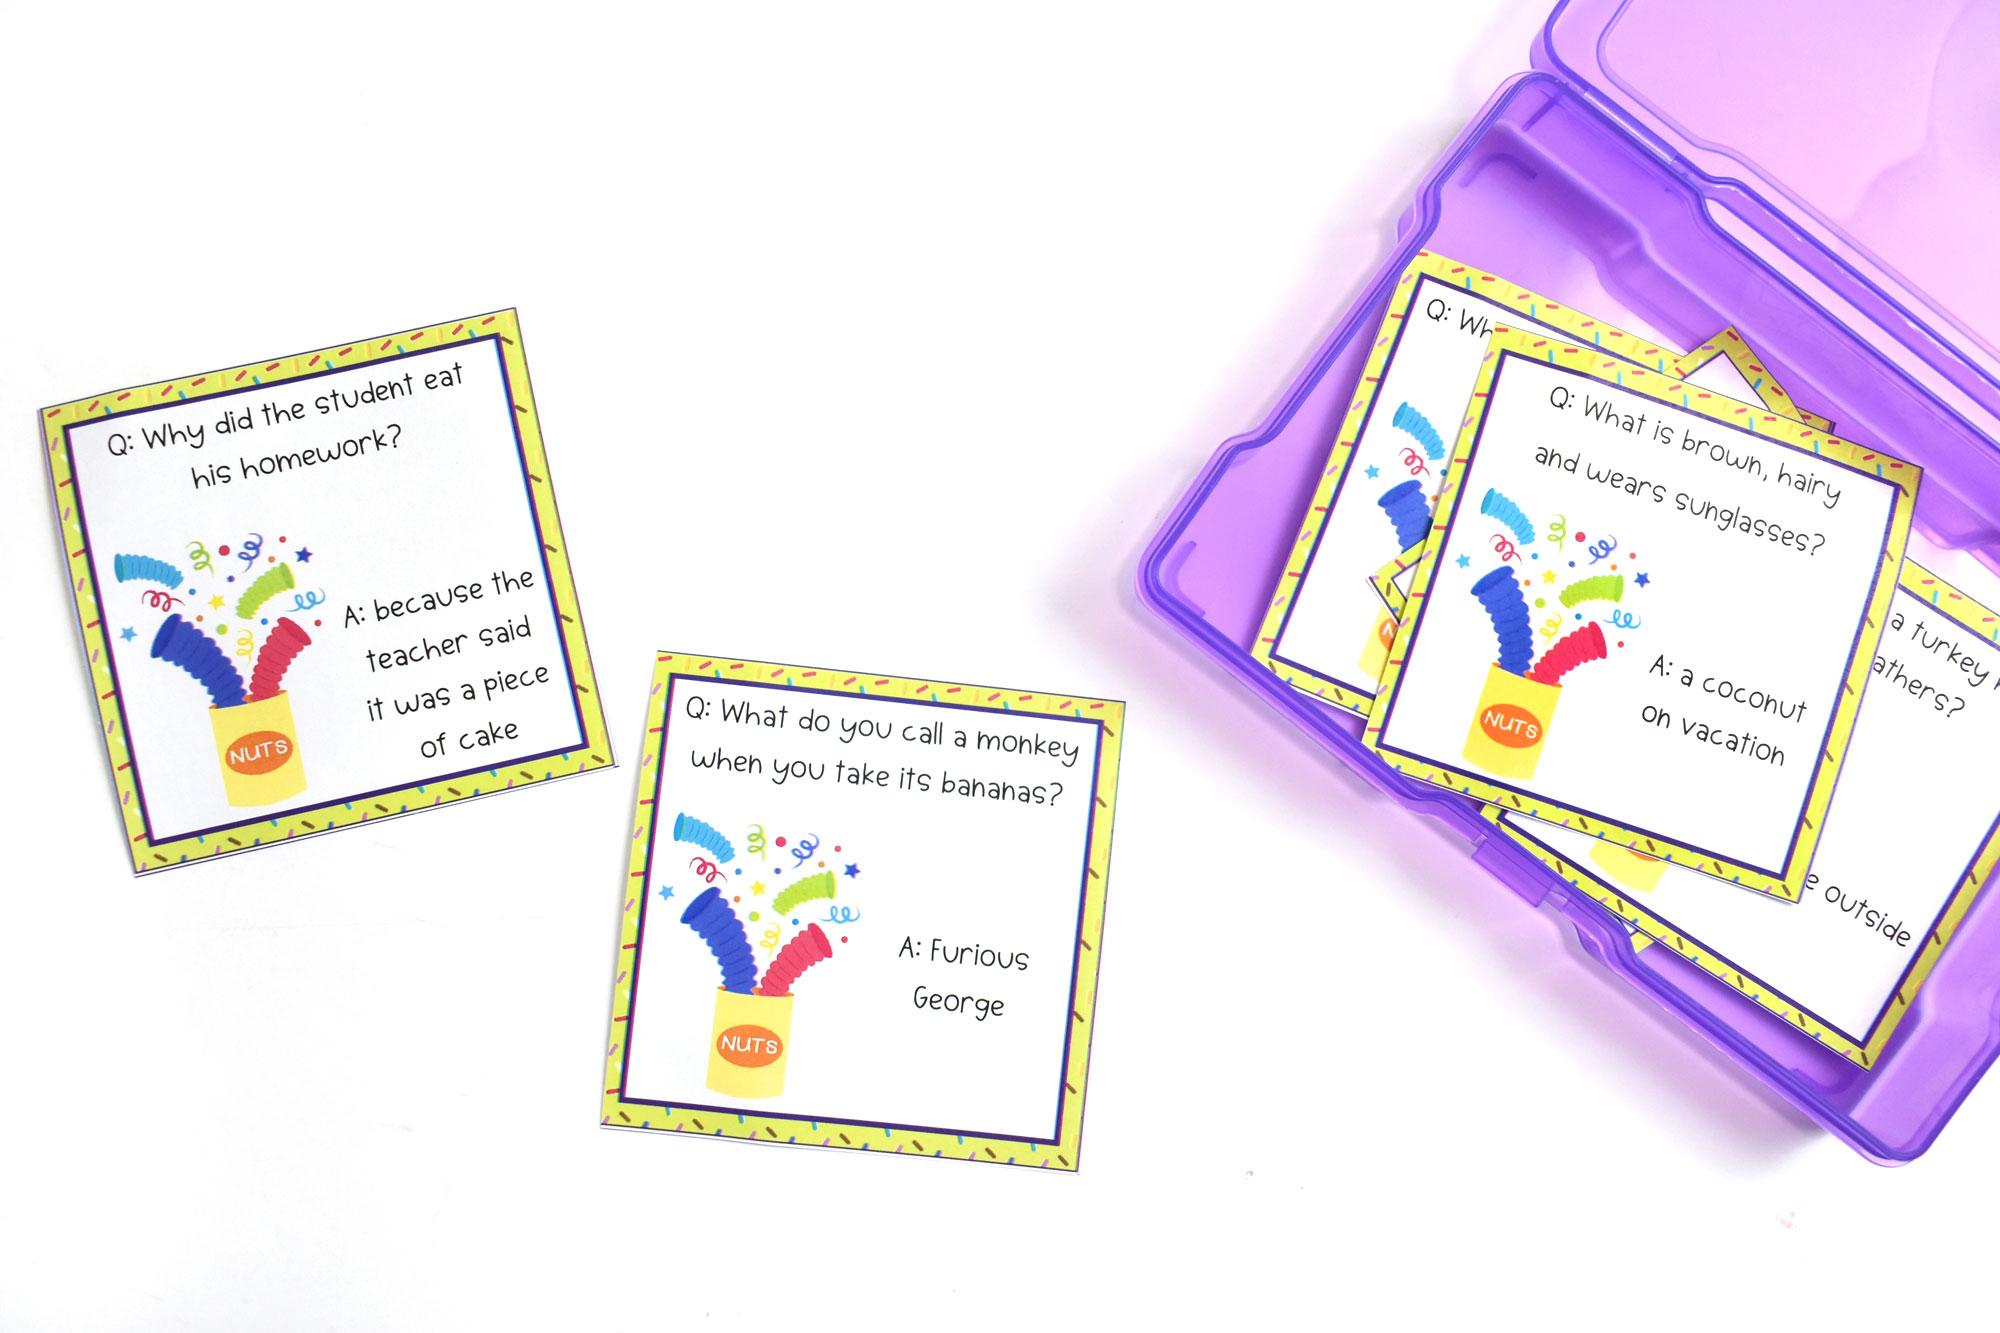 April Fools Day Joke Cards Free Printables | HolidayPrintables.net #printables #holidayprintables #weloveprintables #printablesforkids #educationprintables #homeschoolprintables